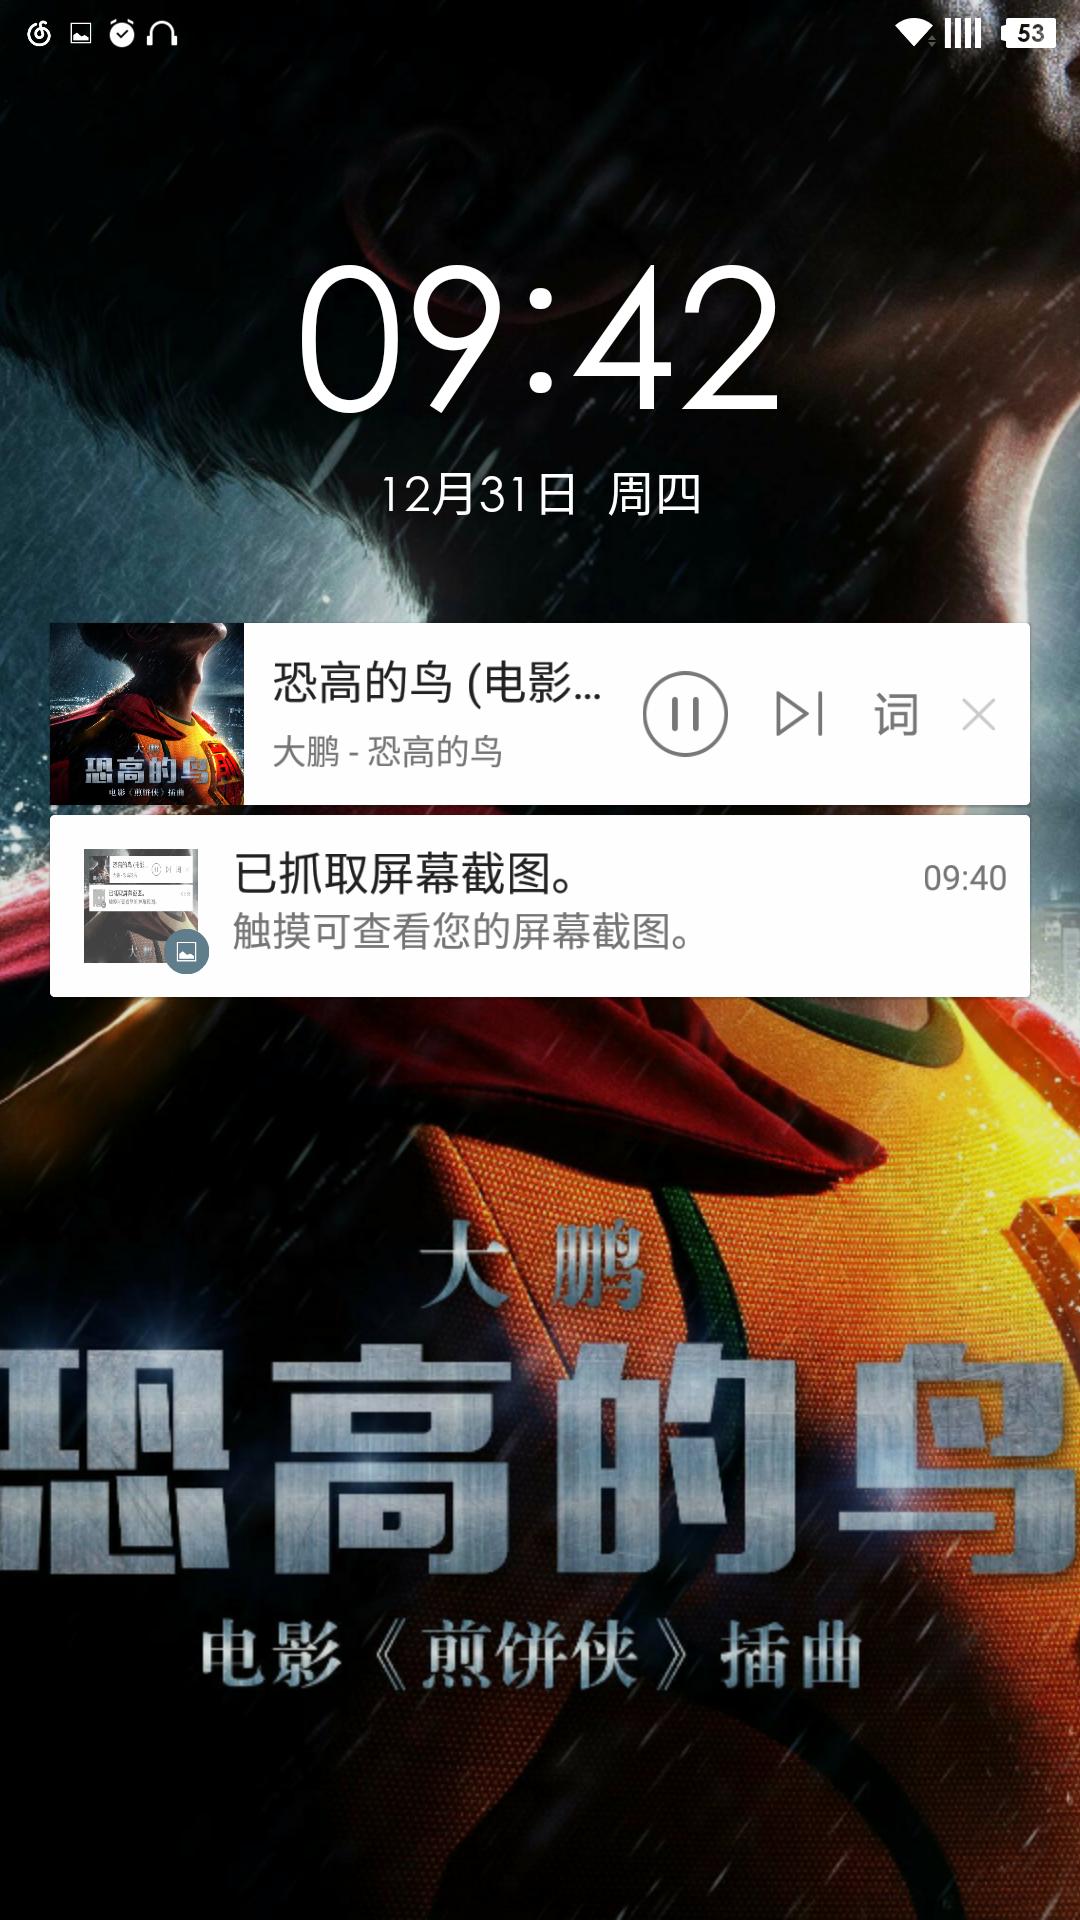 Screenshot_2015-12-31-09-42-53.png